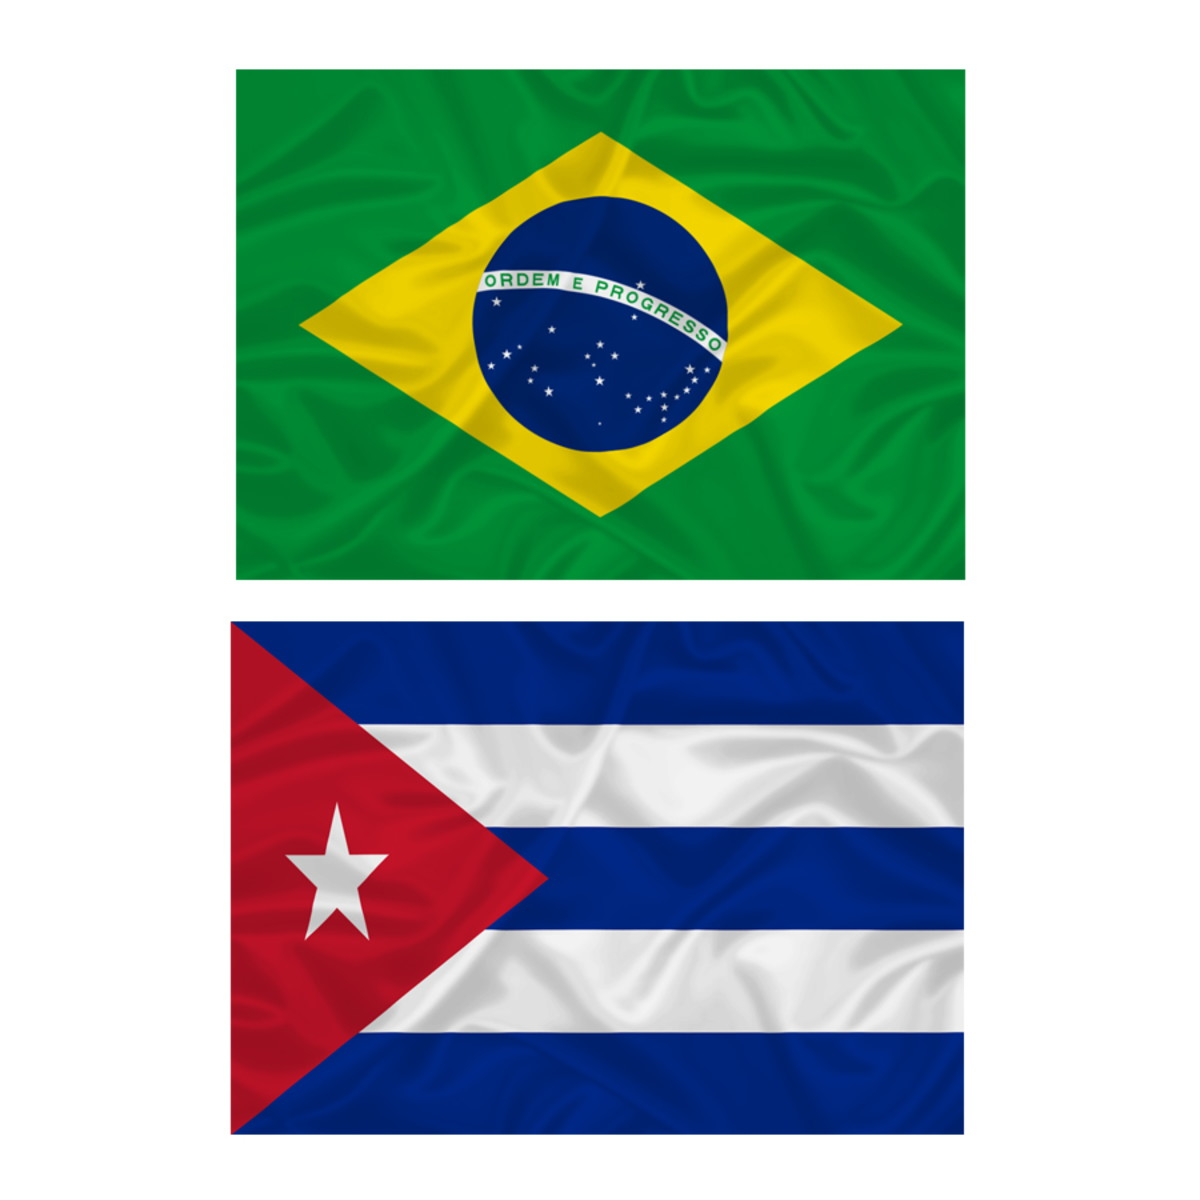 Bandeira da cuba bandeira do brasil kit no elo gabriel ca e jpg 1200x1200  Fotos da df7be9e4147a5